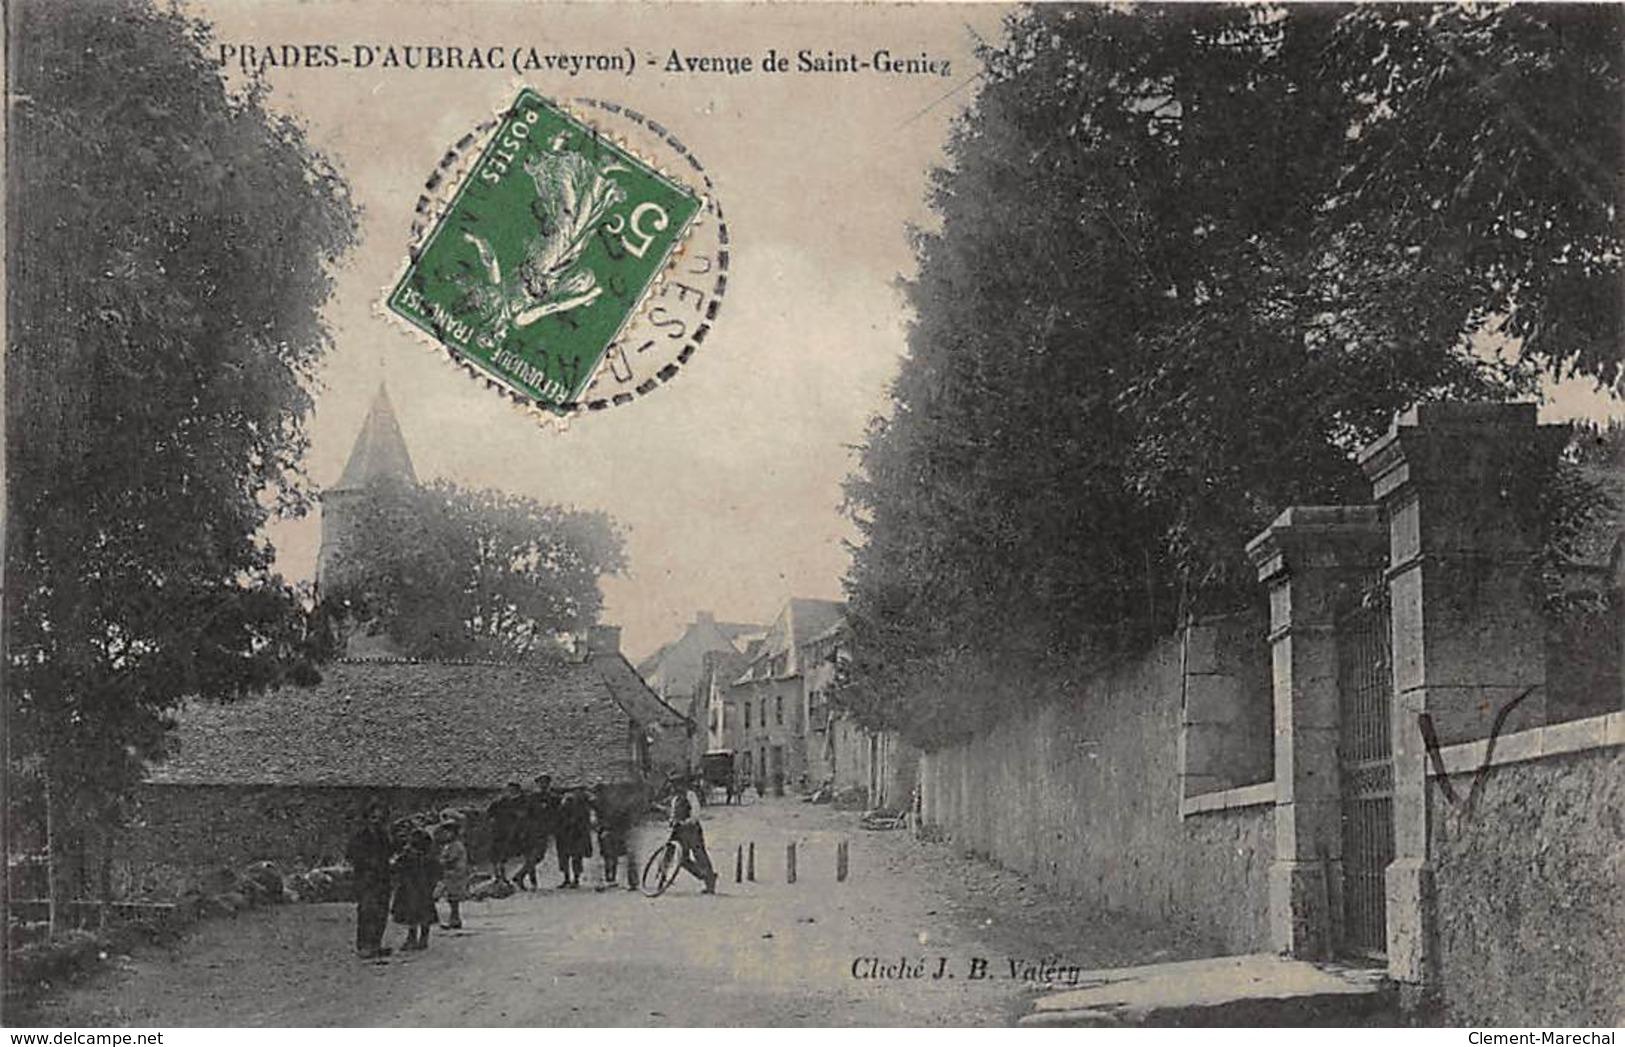 PRADES-D'AUBRAC : Avenue De Saint-geniez, Jeu De Quilles - Tres Bon Etat - France